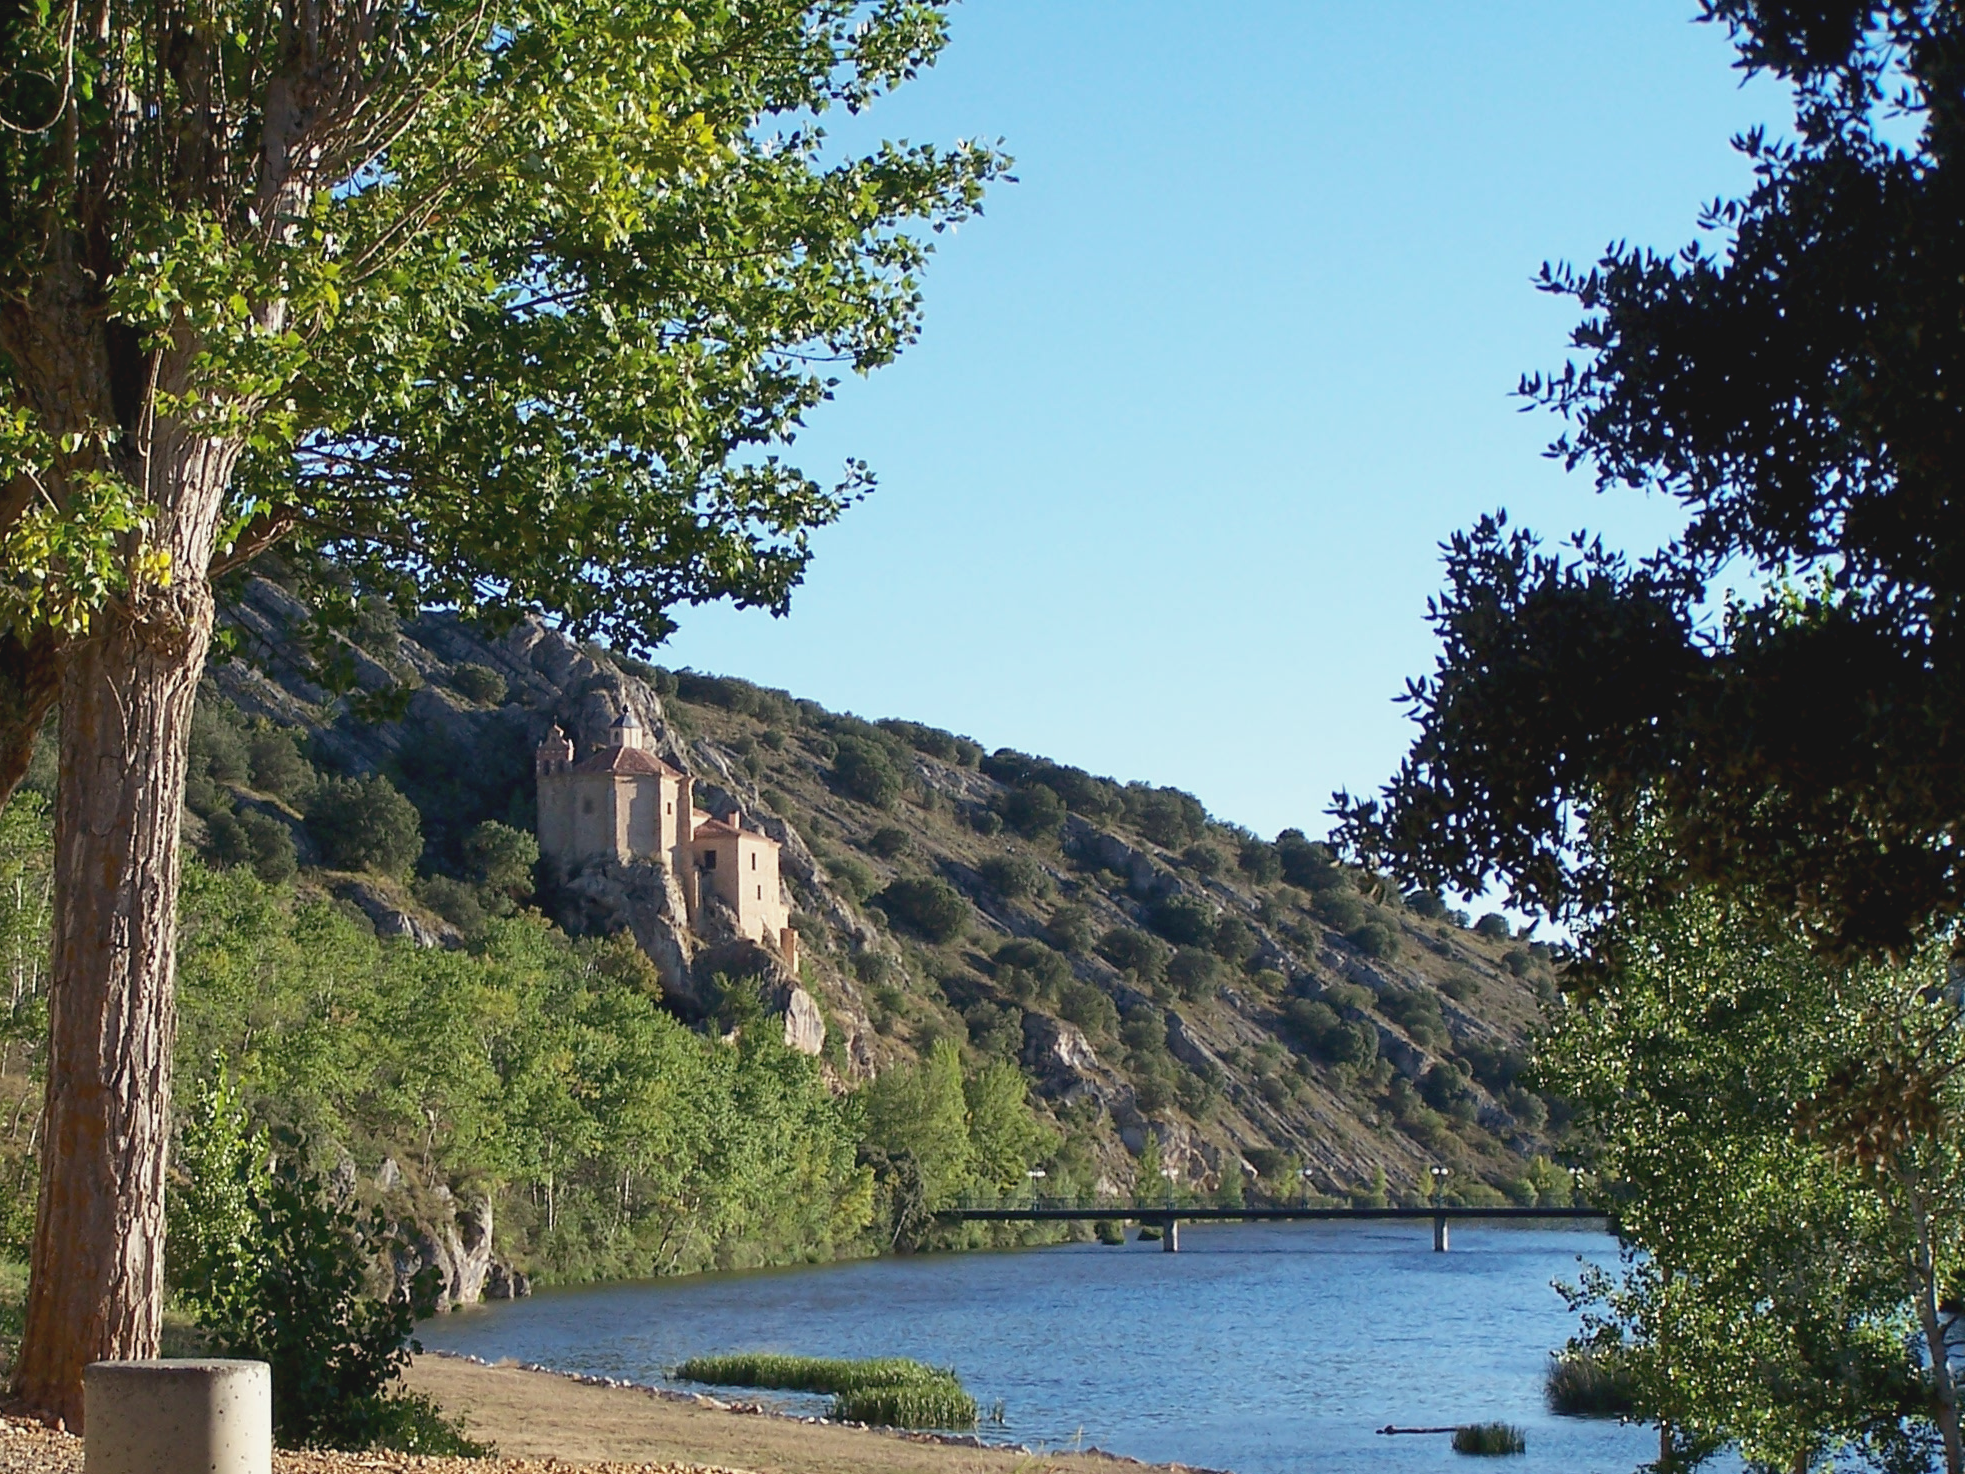 File:Ermita de San Saturio.png - Wikimedia Commons